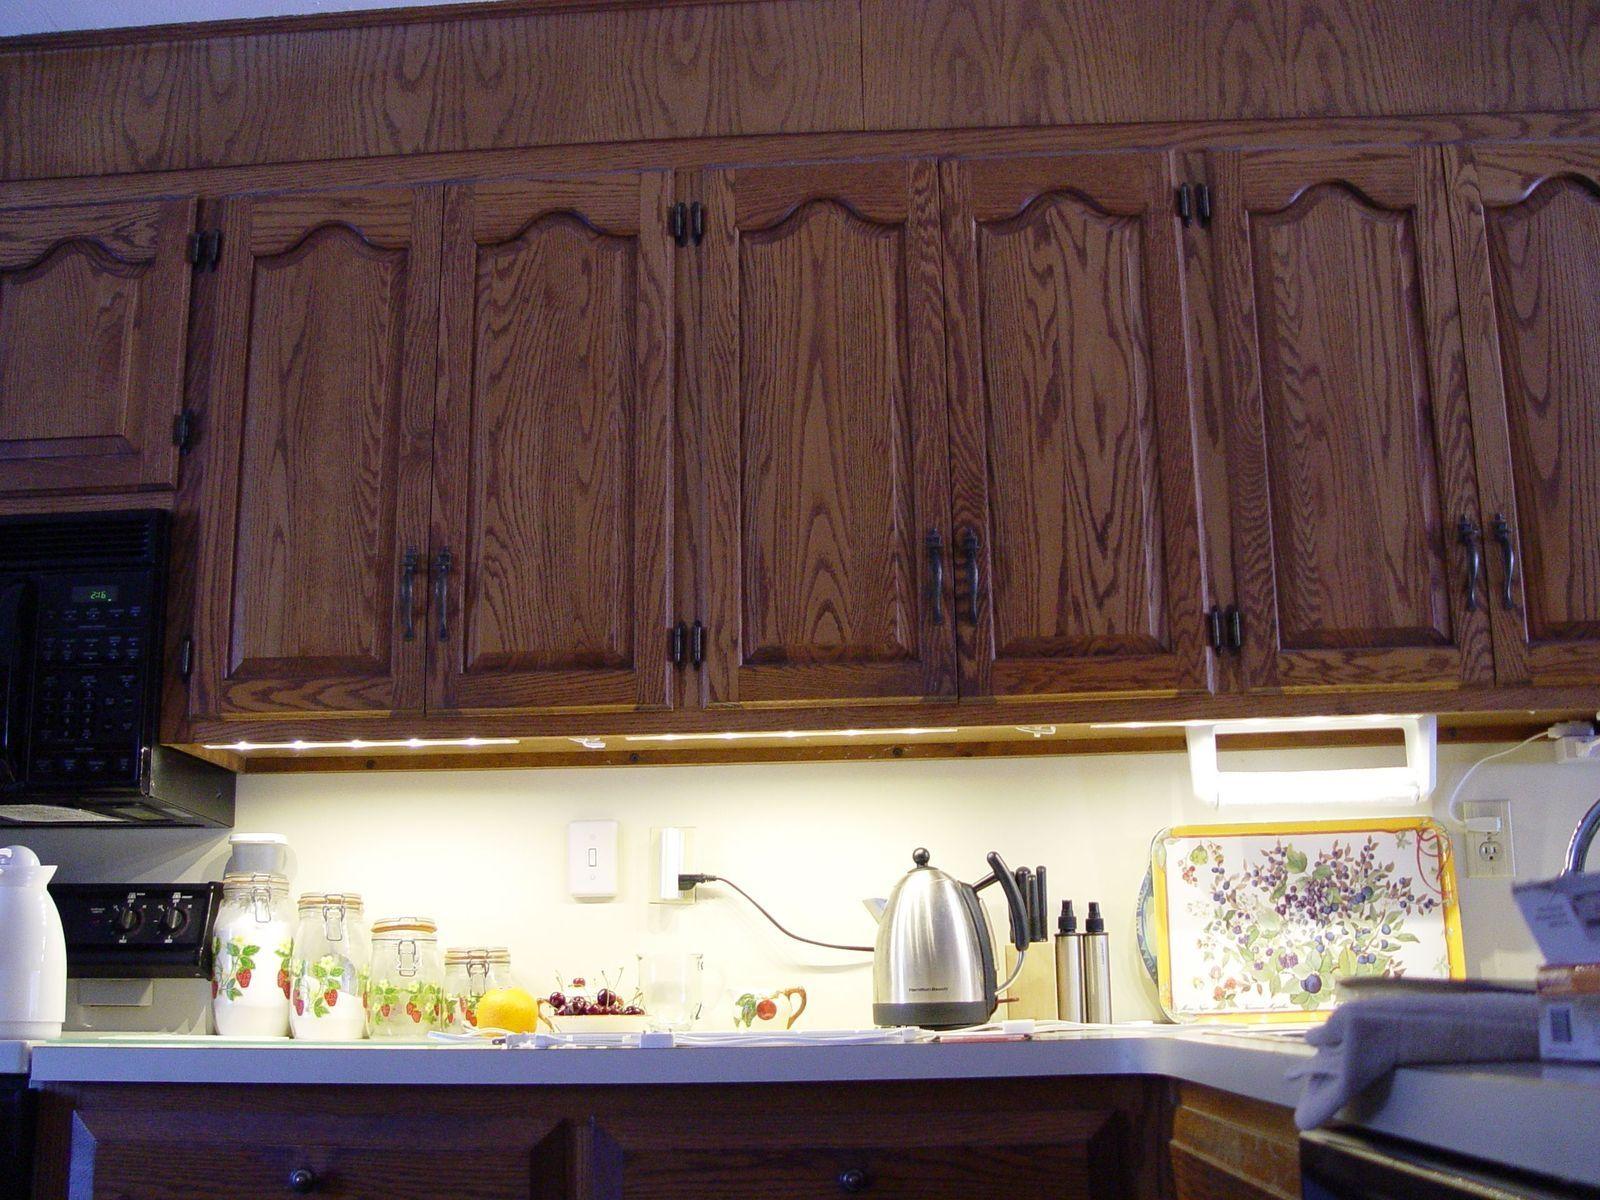 Utilitech Led Lighting For Under Cabinet